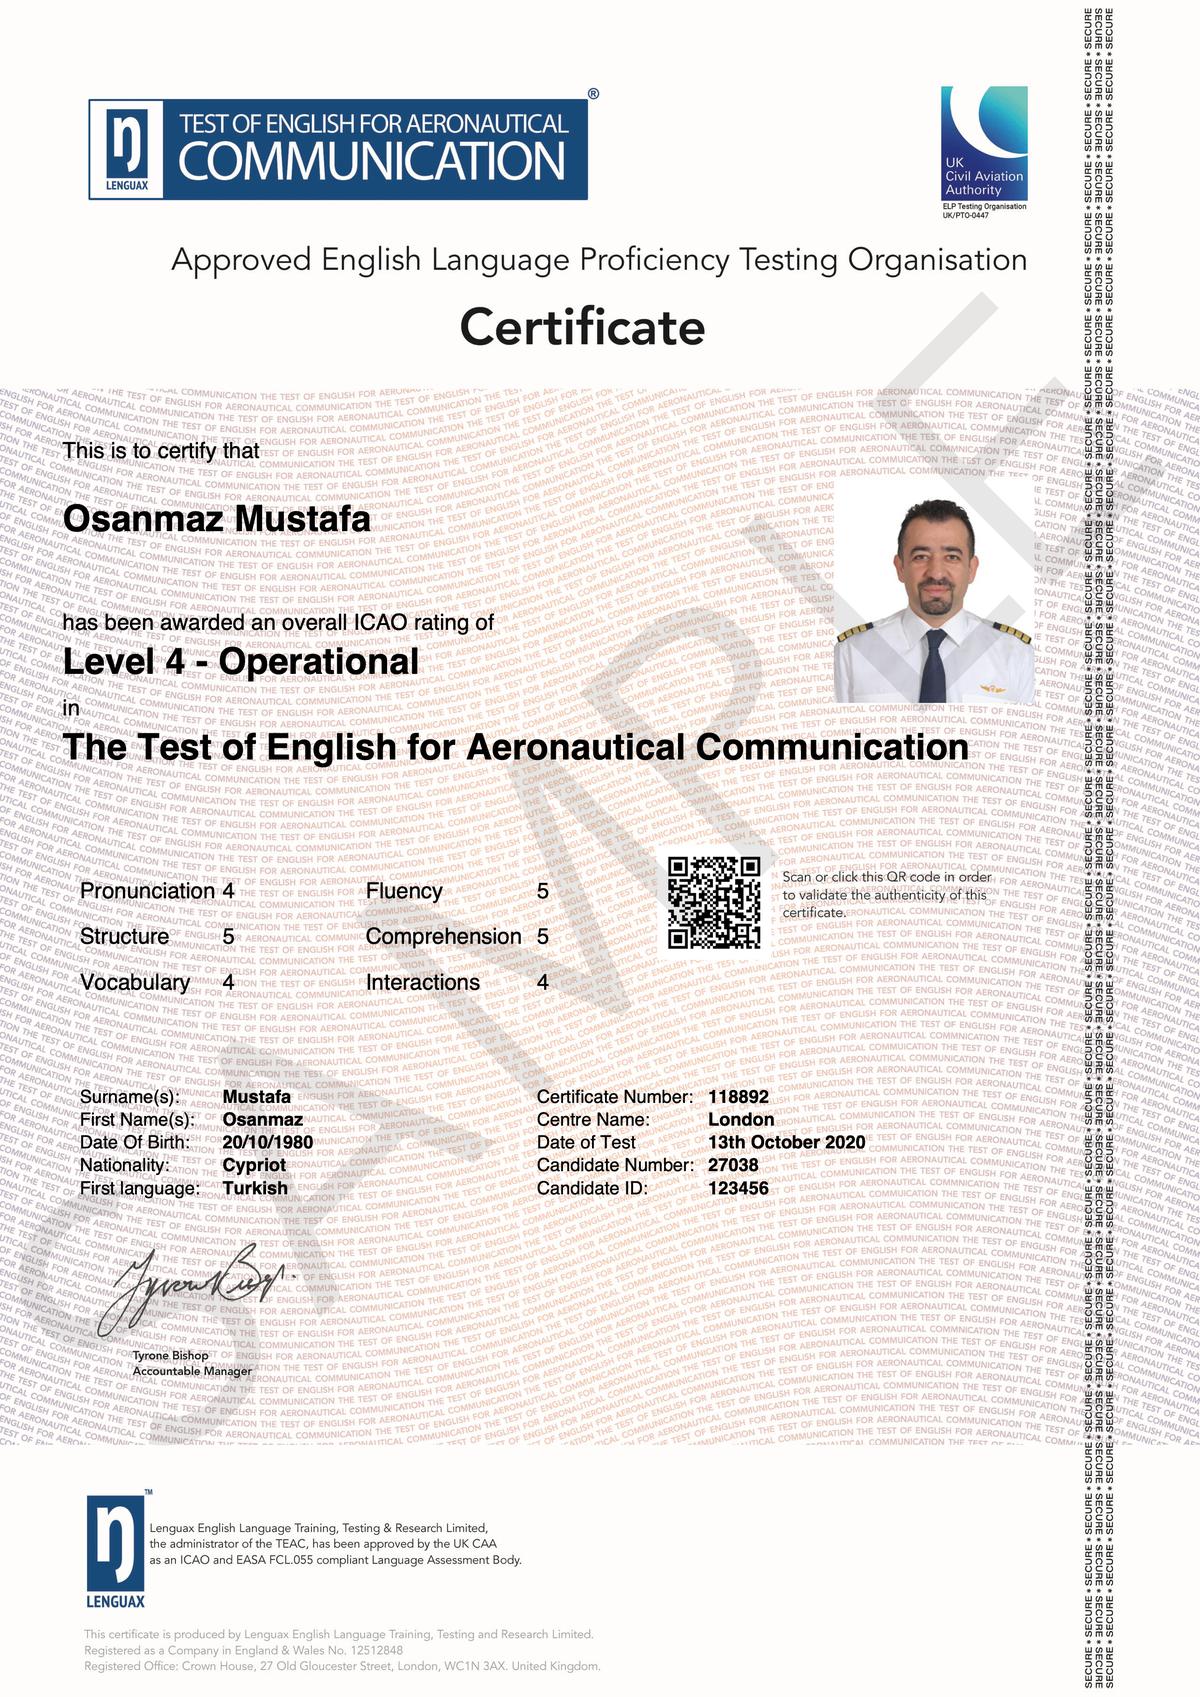 UK CAA Certificate